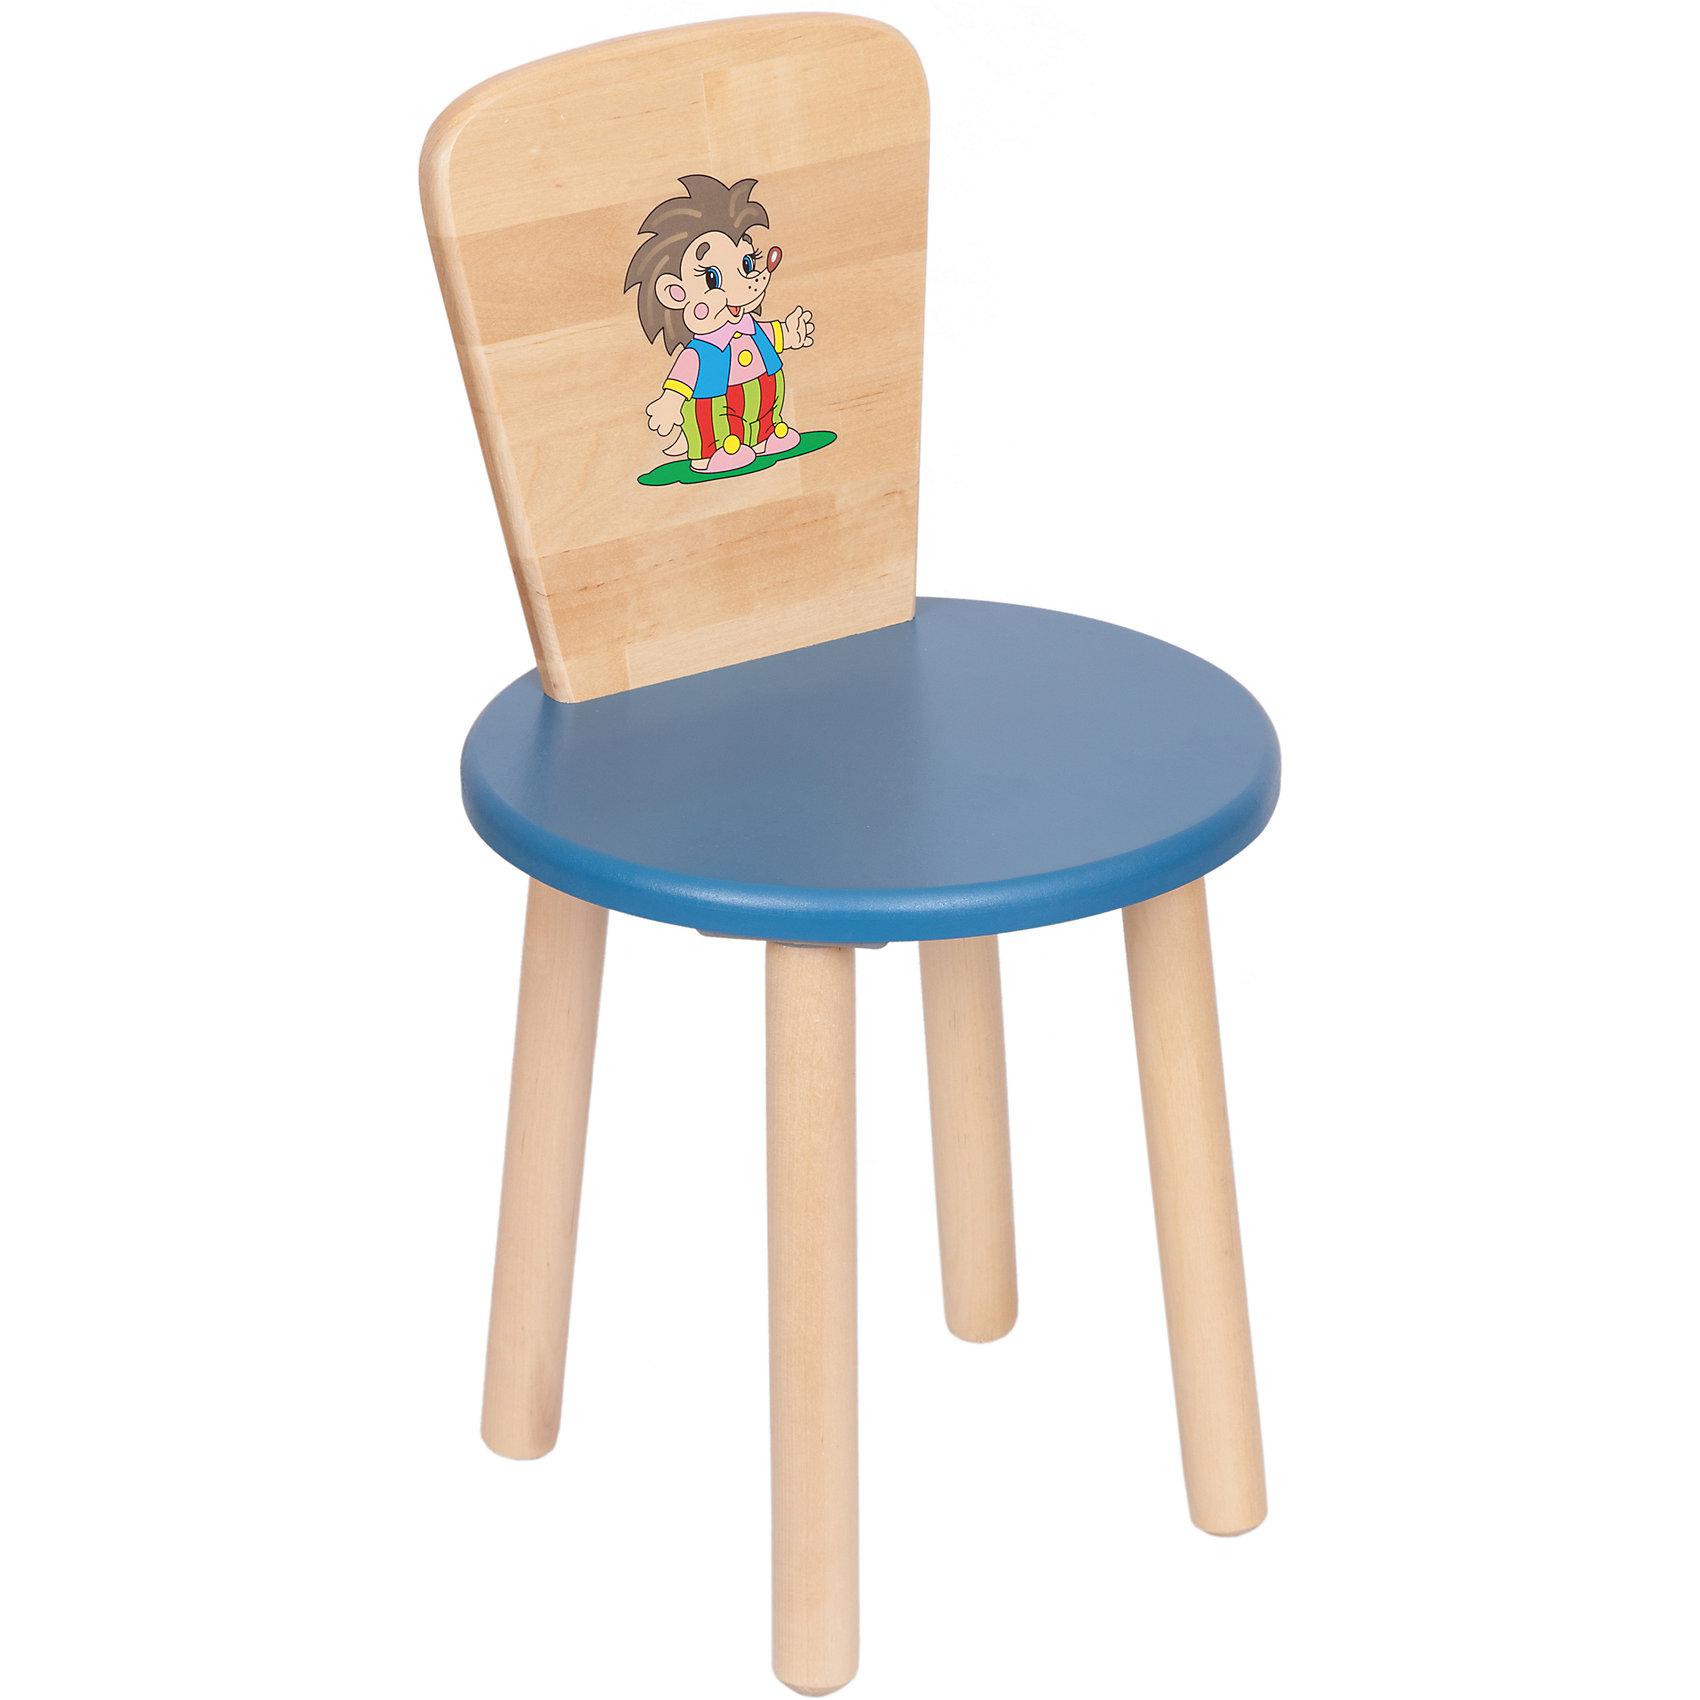 РусЭкоМебель Синий стул